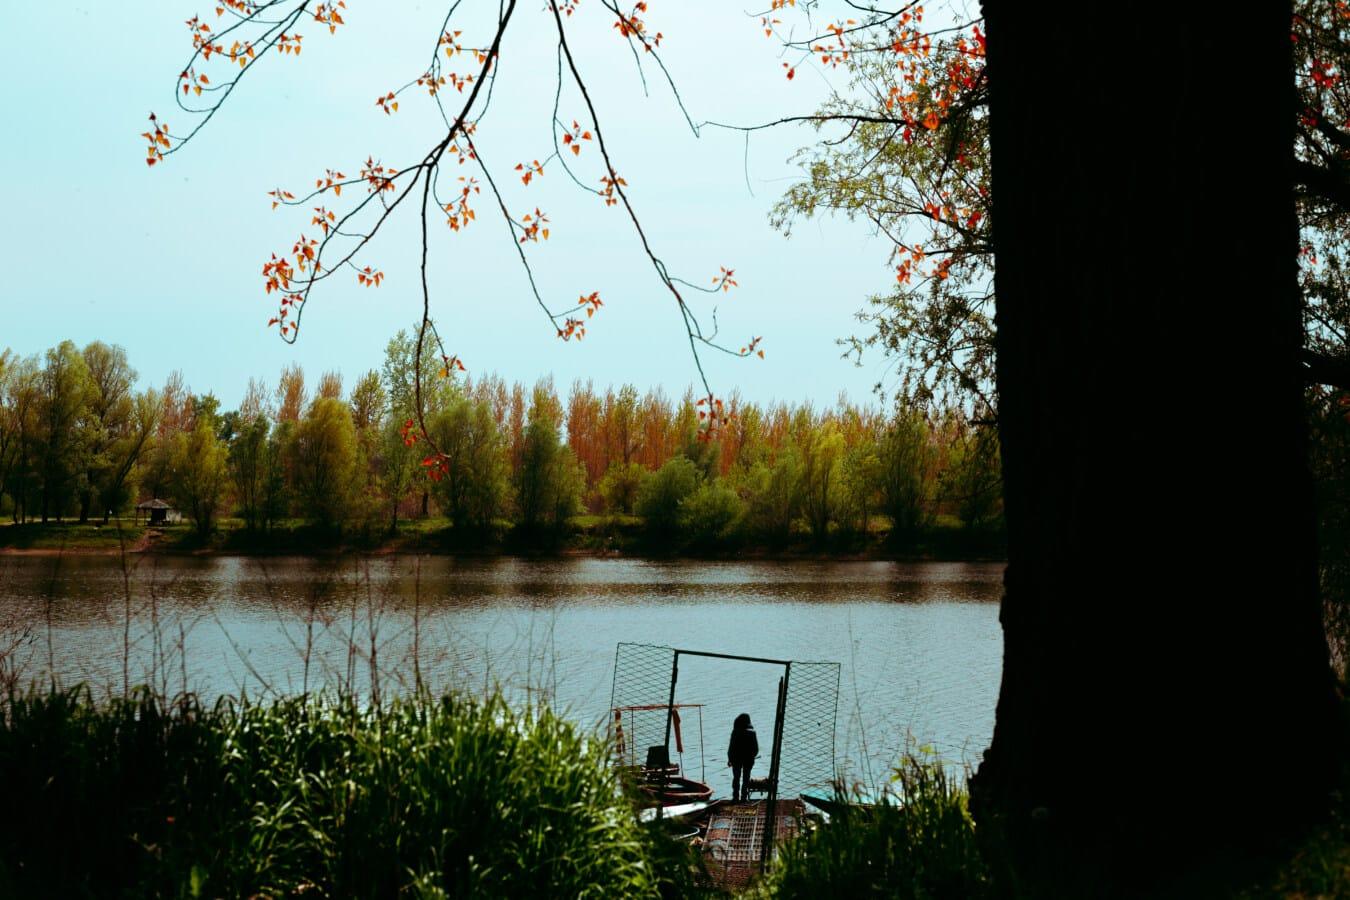 Struktur, Schatten, Flussufer, Person, Flussschiff, Landschaft, Natur, Sumpf, Wasser, Reflexion